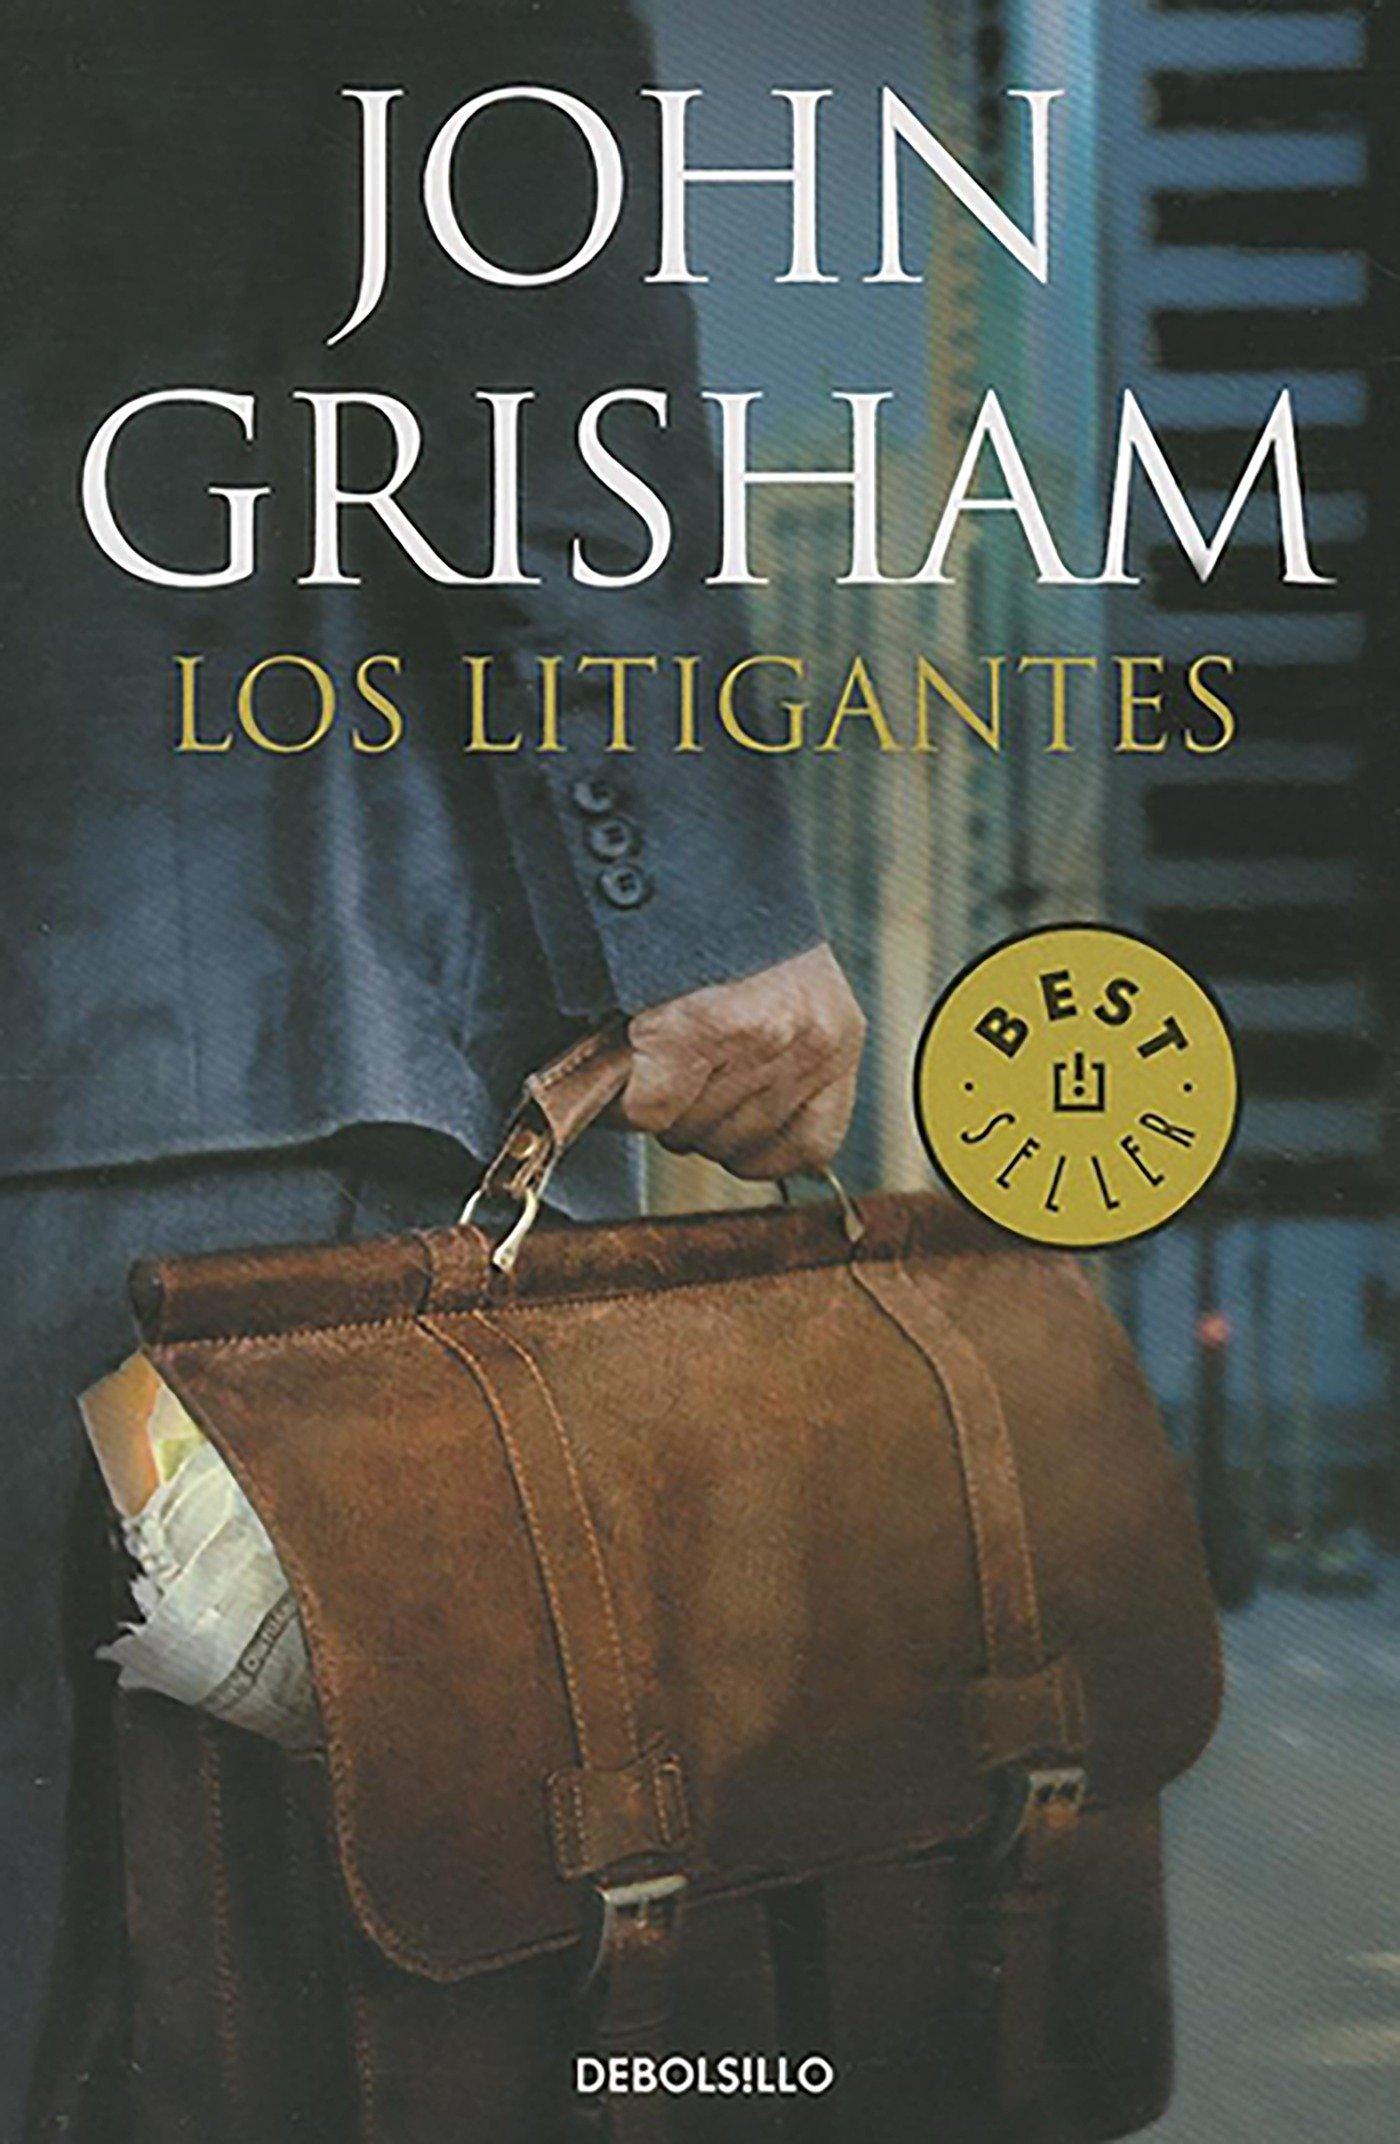 Los litigantes / The Litigators (Best Seller (Debolsillo)) (Spanish Edition)